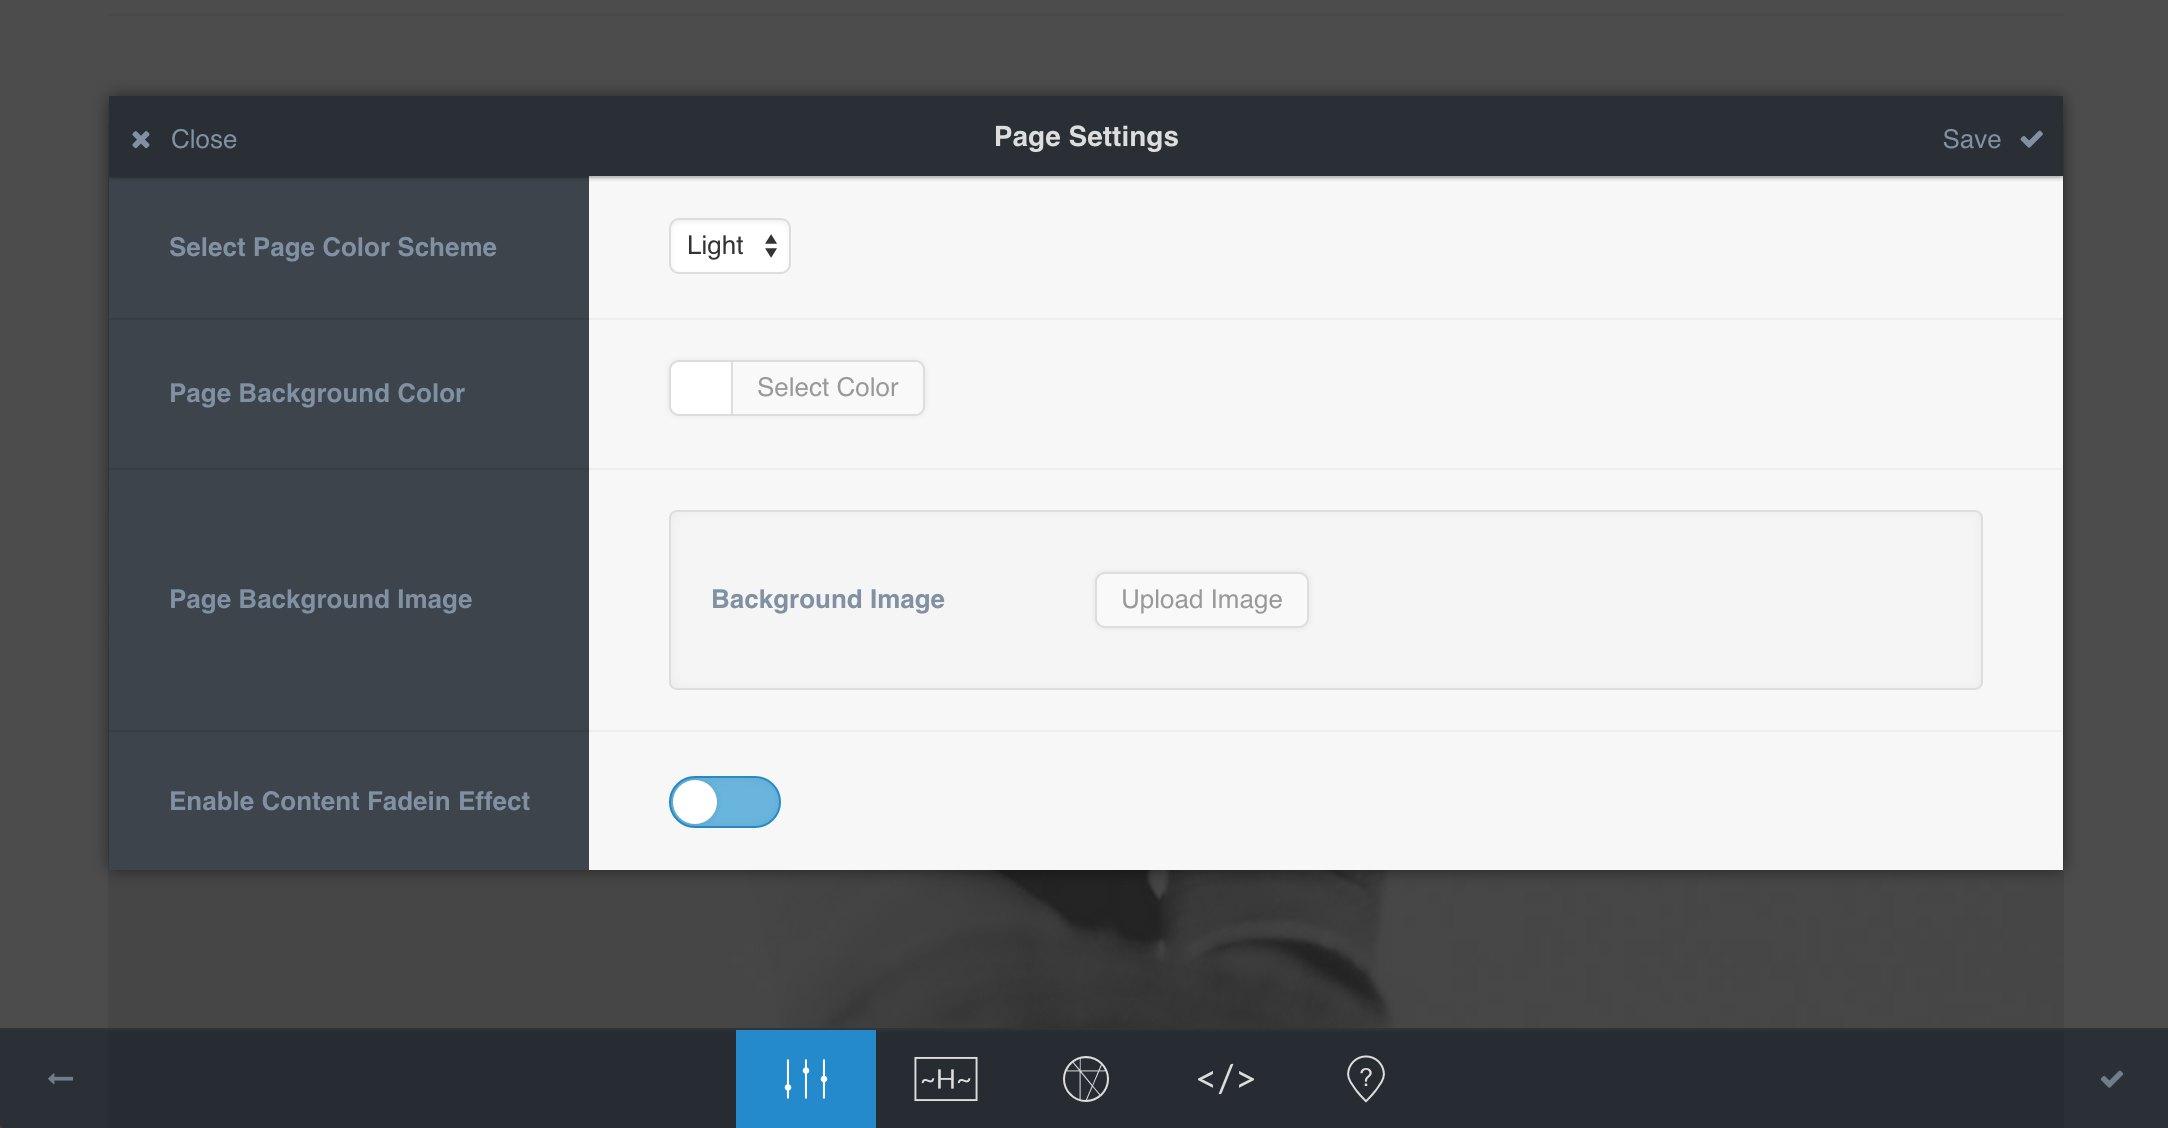 page-settings-panel